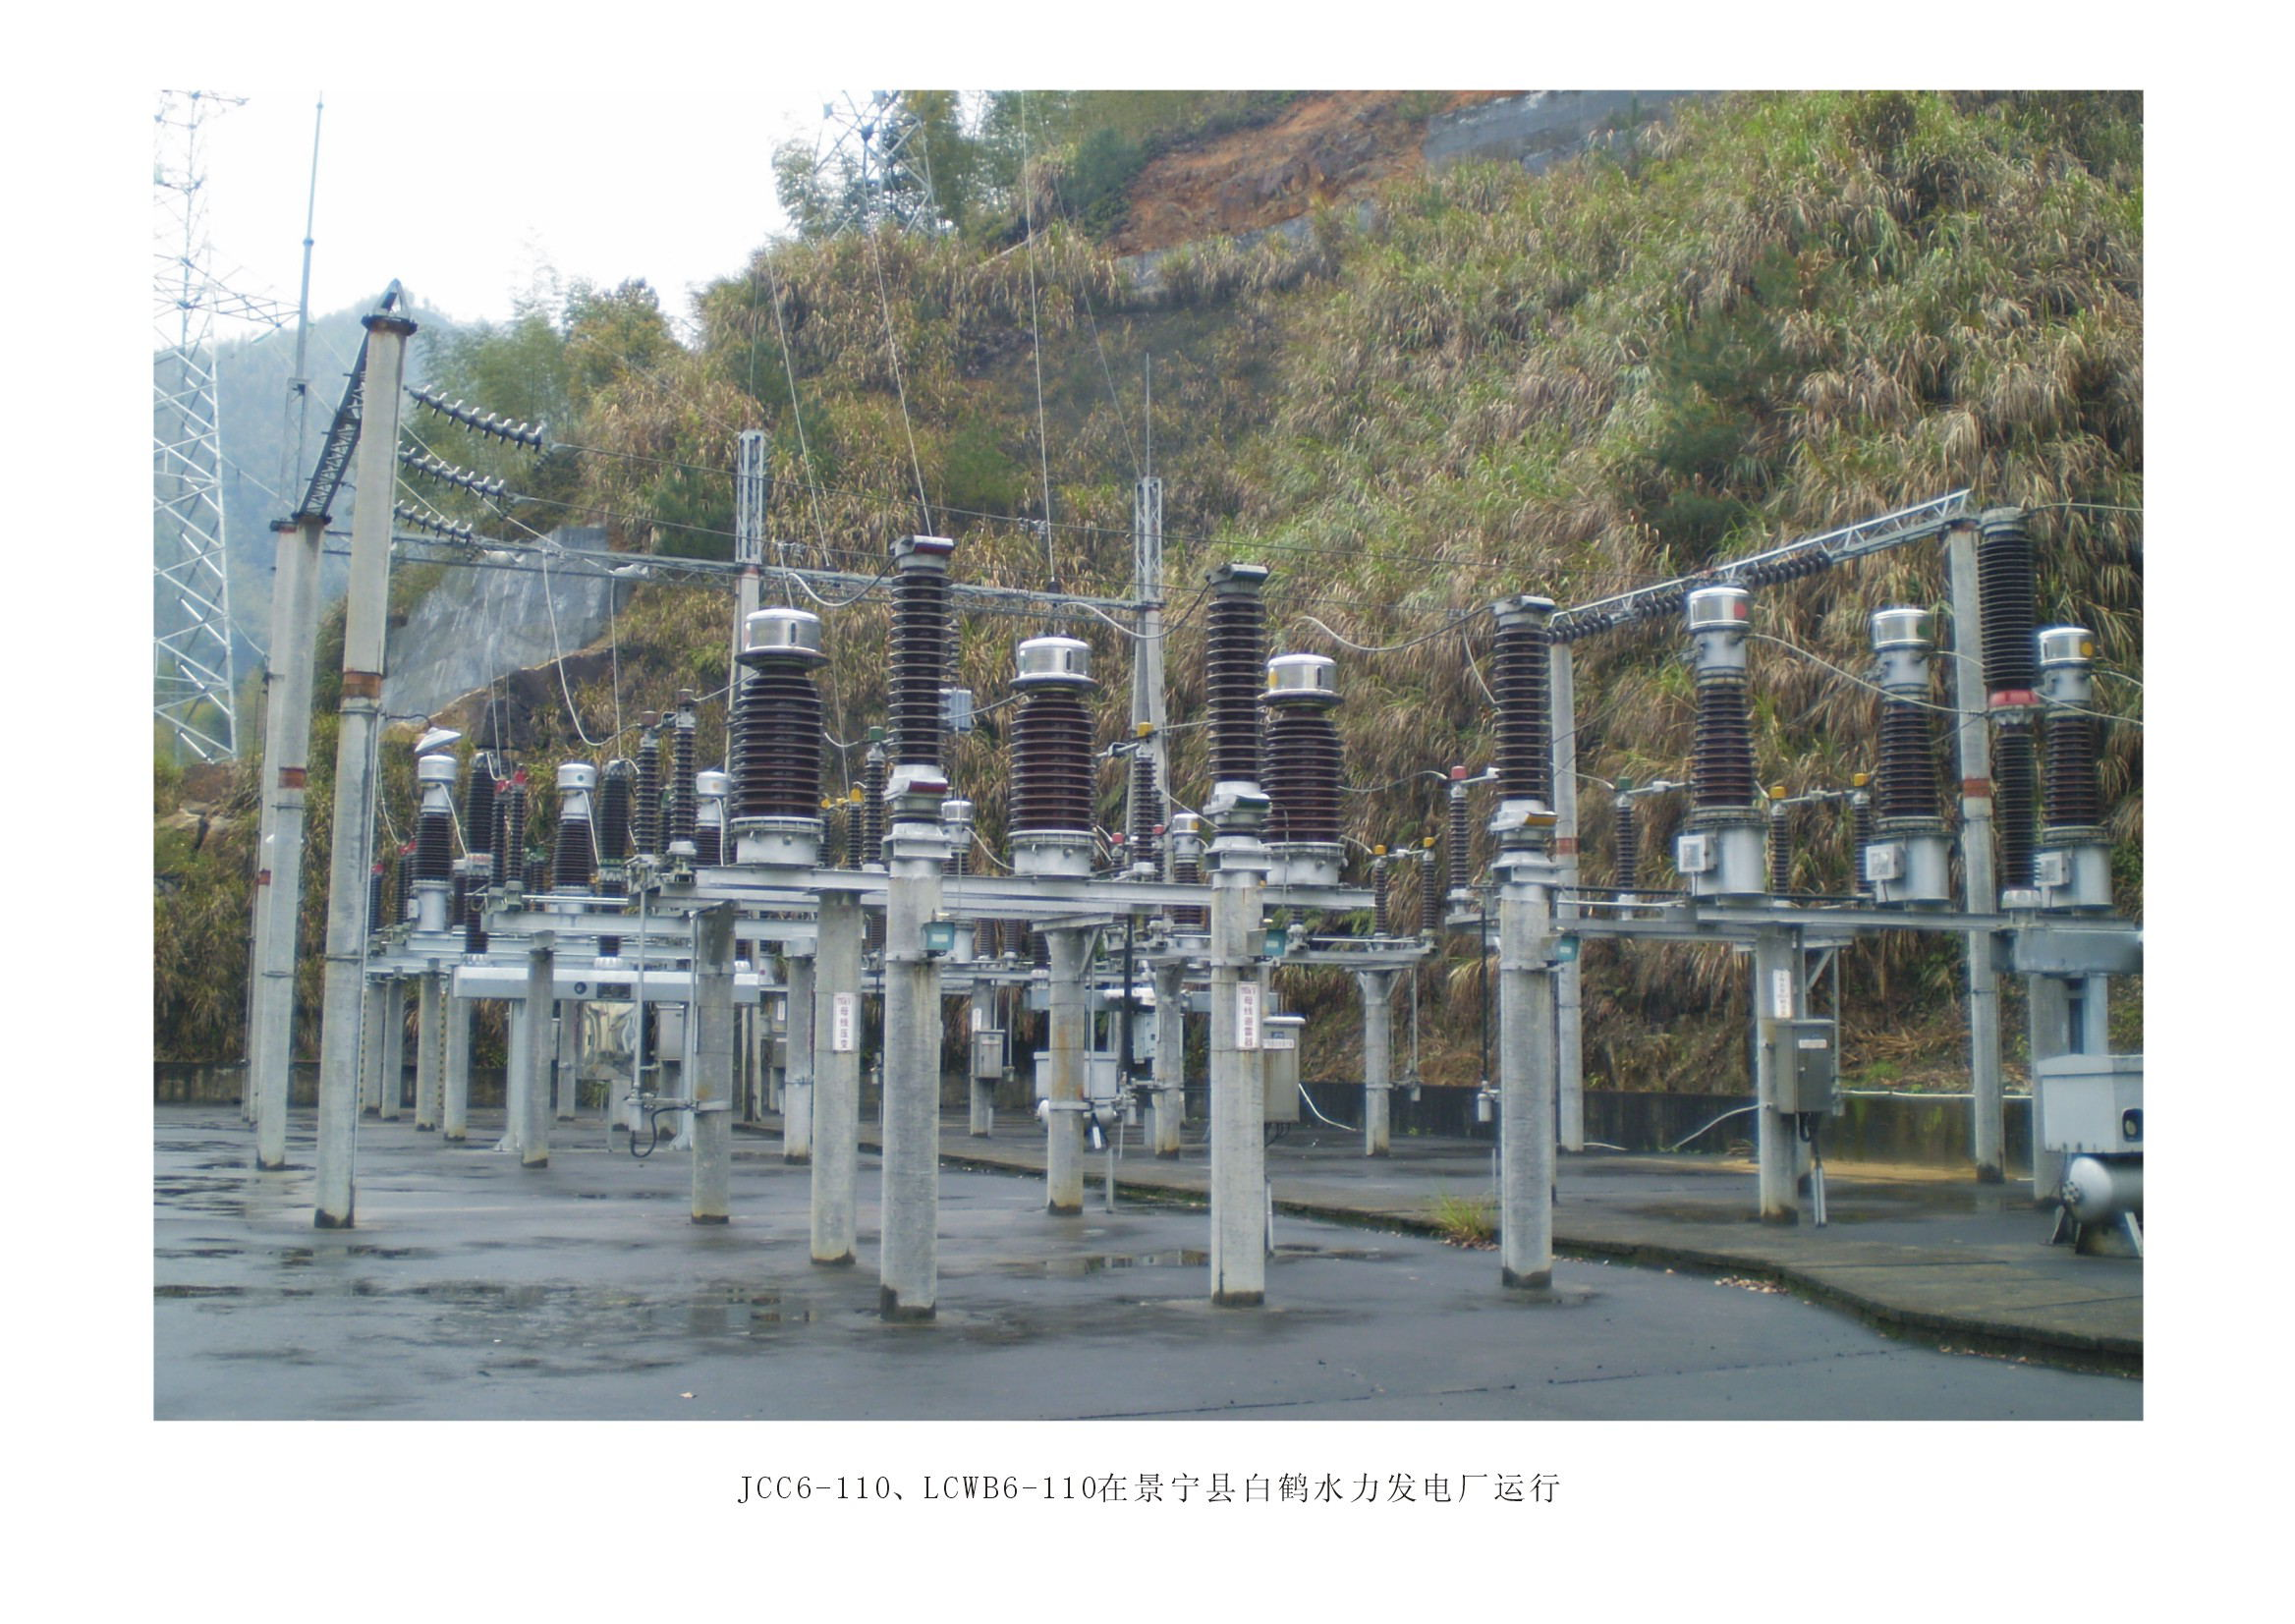 60JCC6-110、LCWB6-110在景寧縣白鶴水力發電廠運行